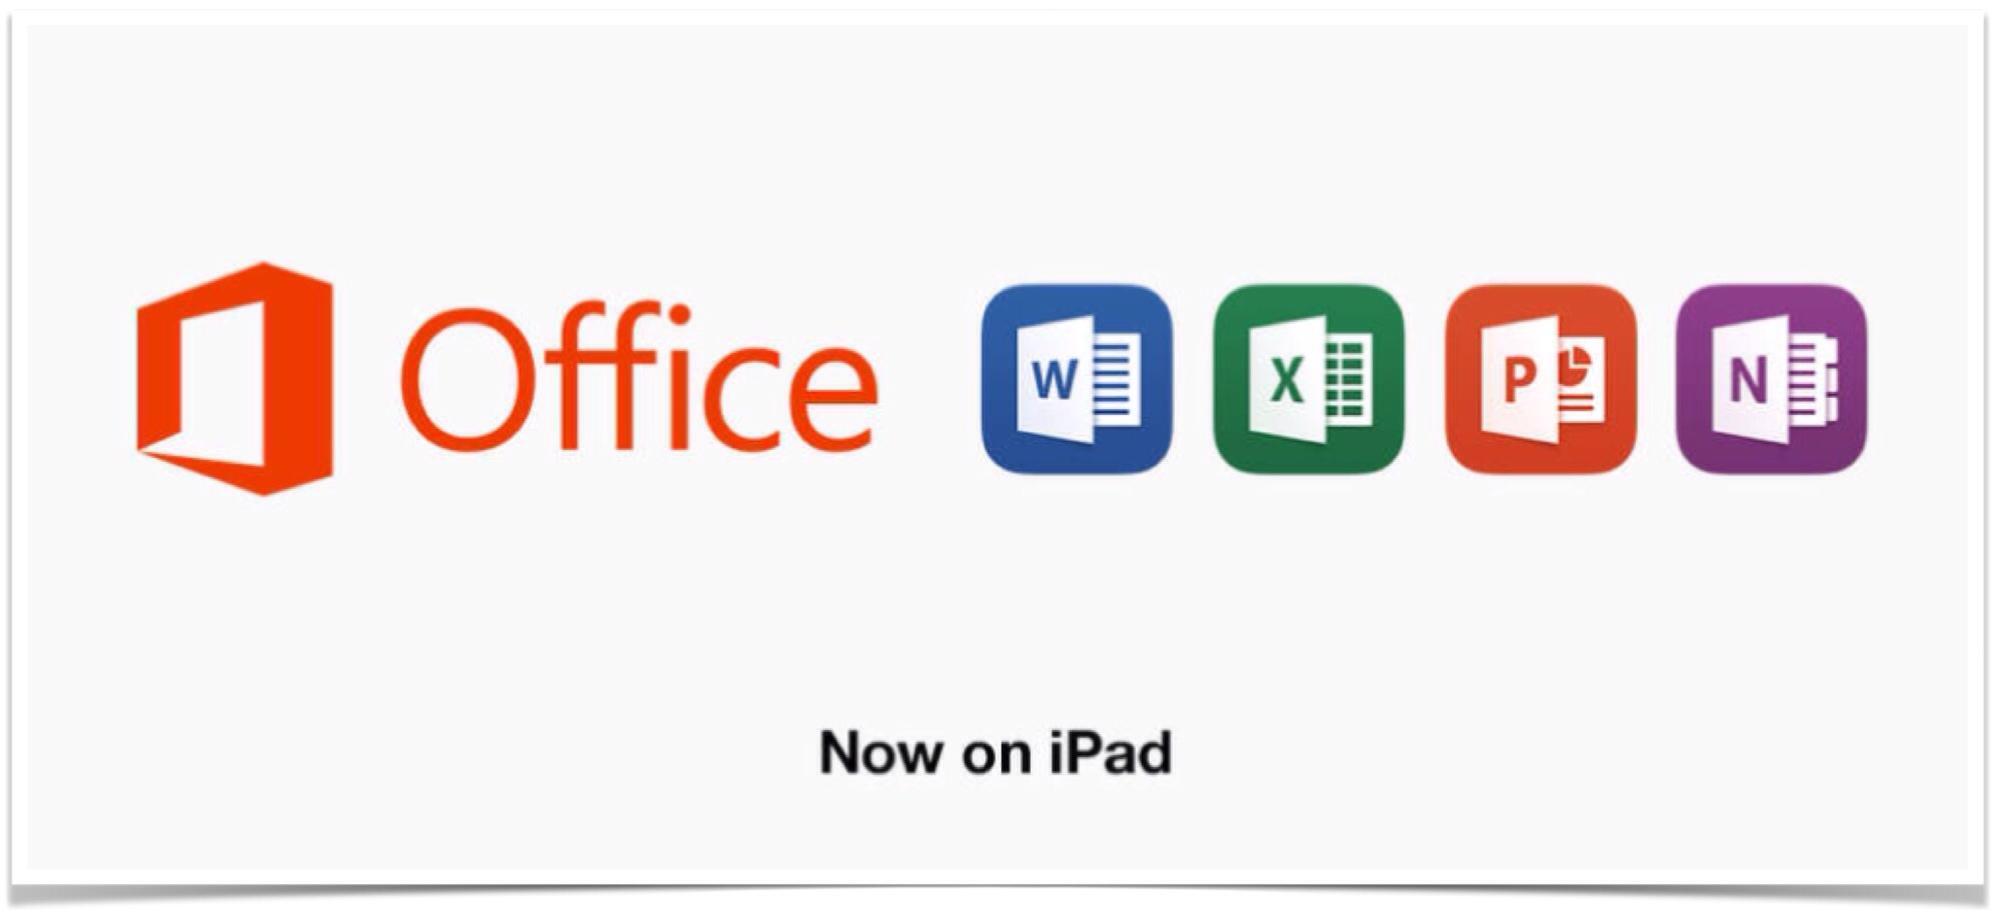 microsoft office apps